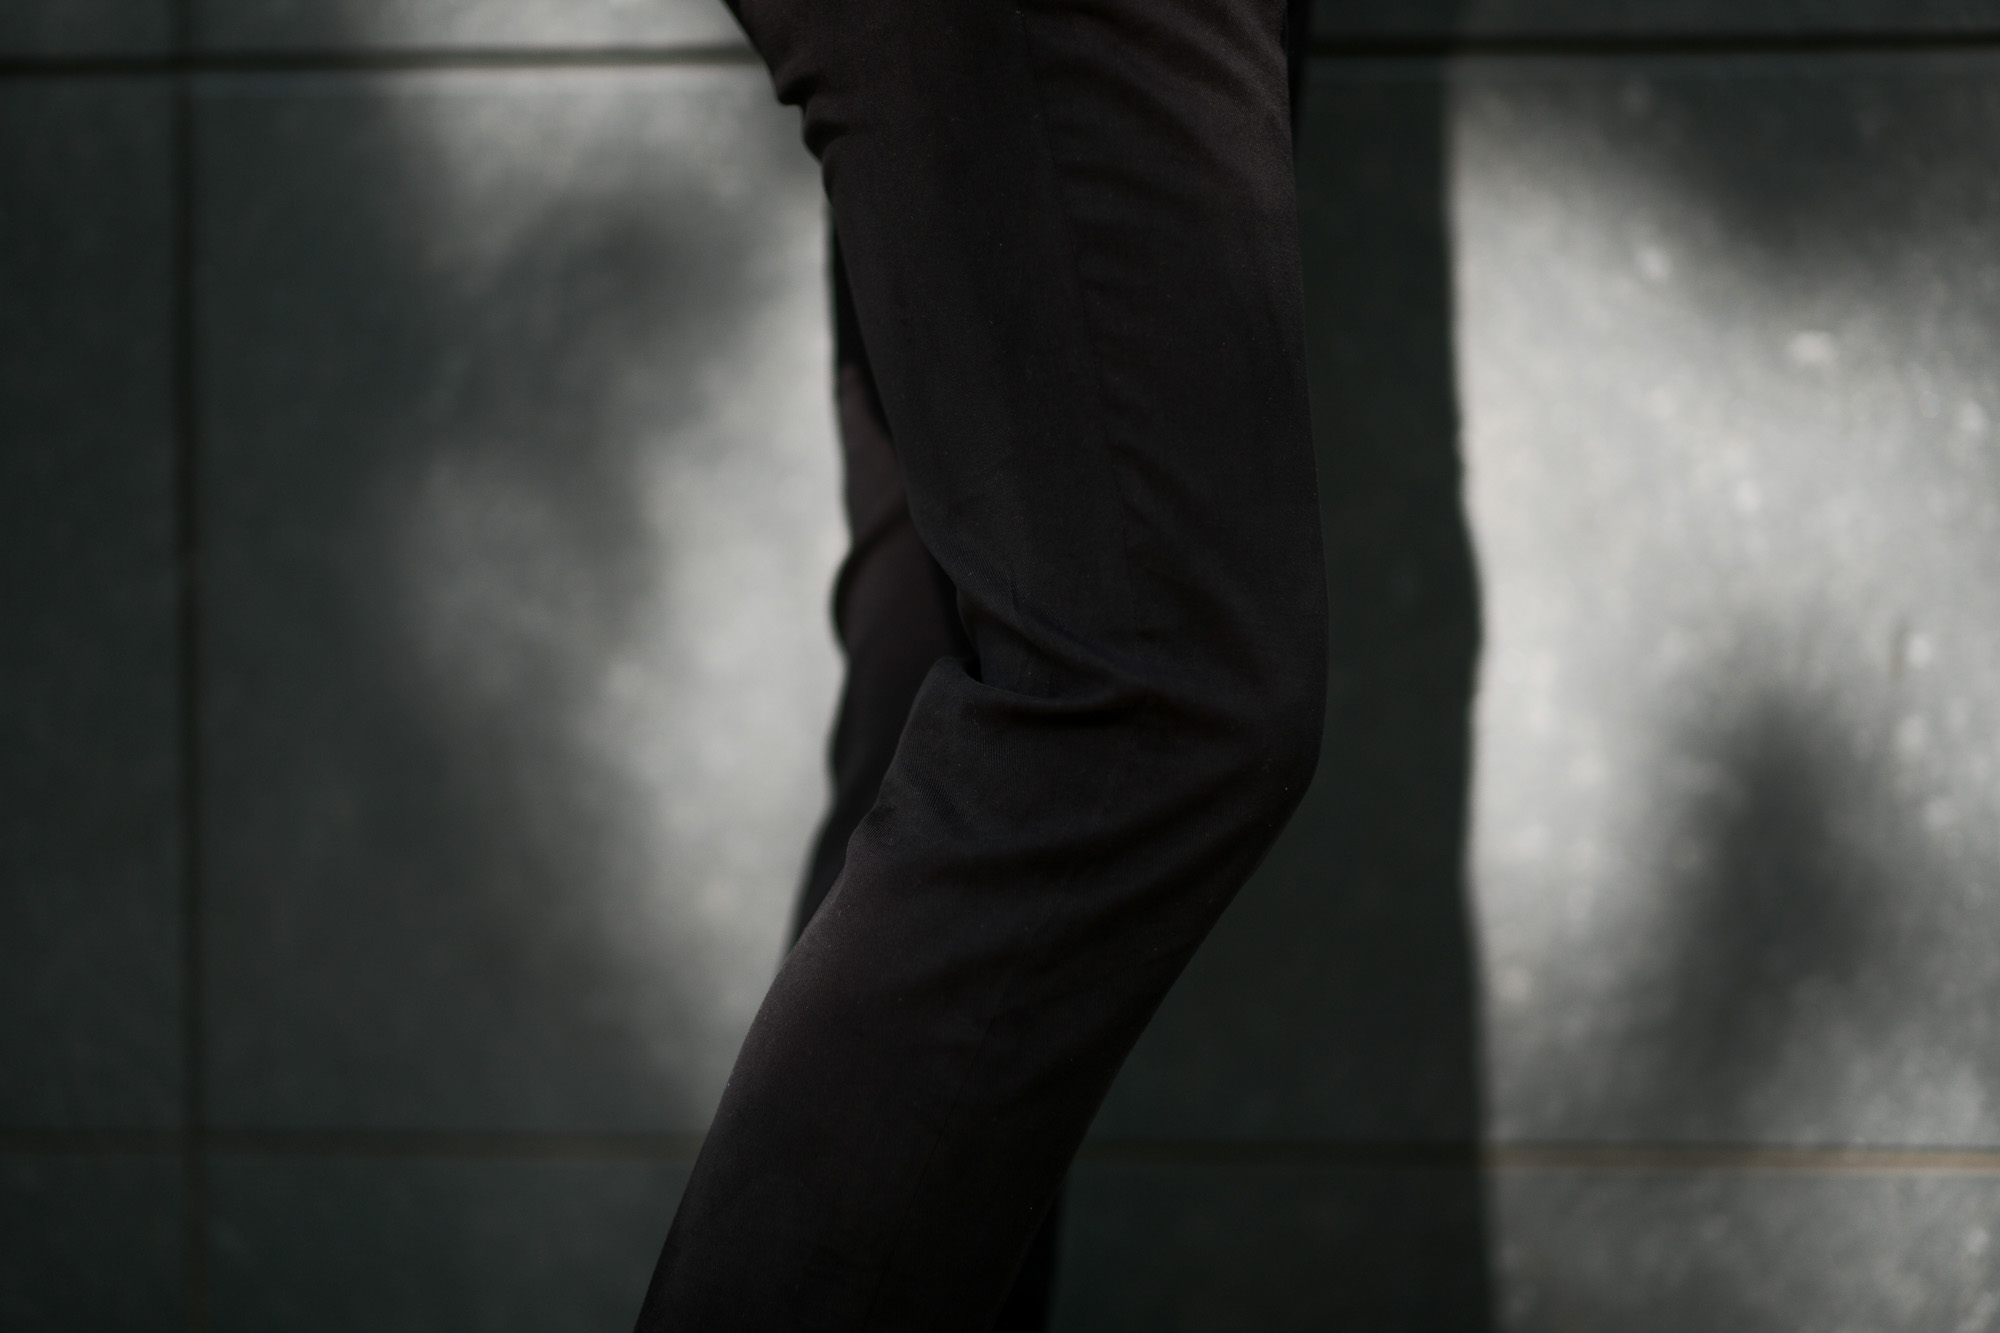 Cuervo (クエルボ) Sartoria Collection (サルトリア コレクション) Rooster (ルースター) STRETCH COTTON ストレッチコットン スーツ BLACK (ブラック) MADE IN JAPAN (日本製) 2019 秋冬 【ご予約開始】alto e diritto アルトエデリット